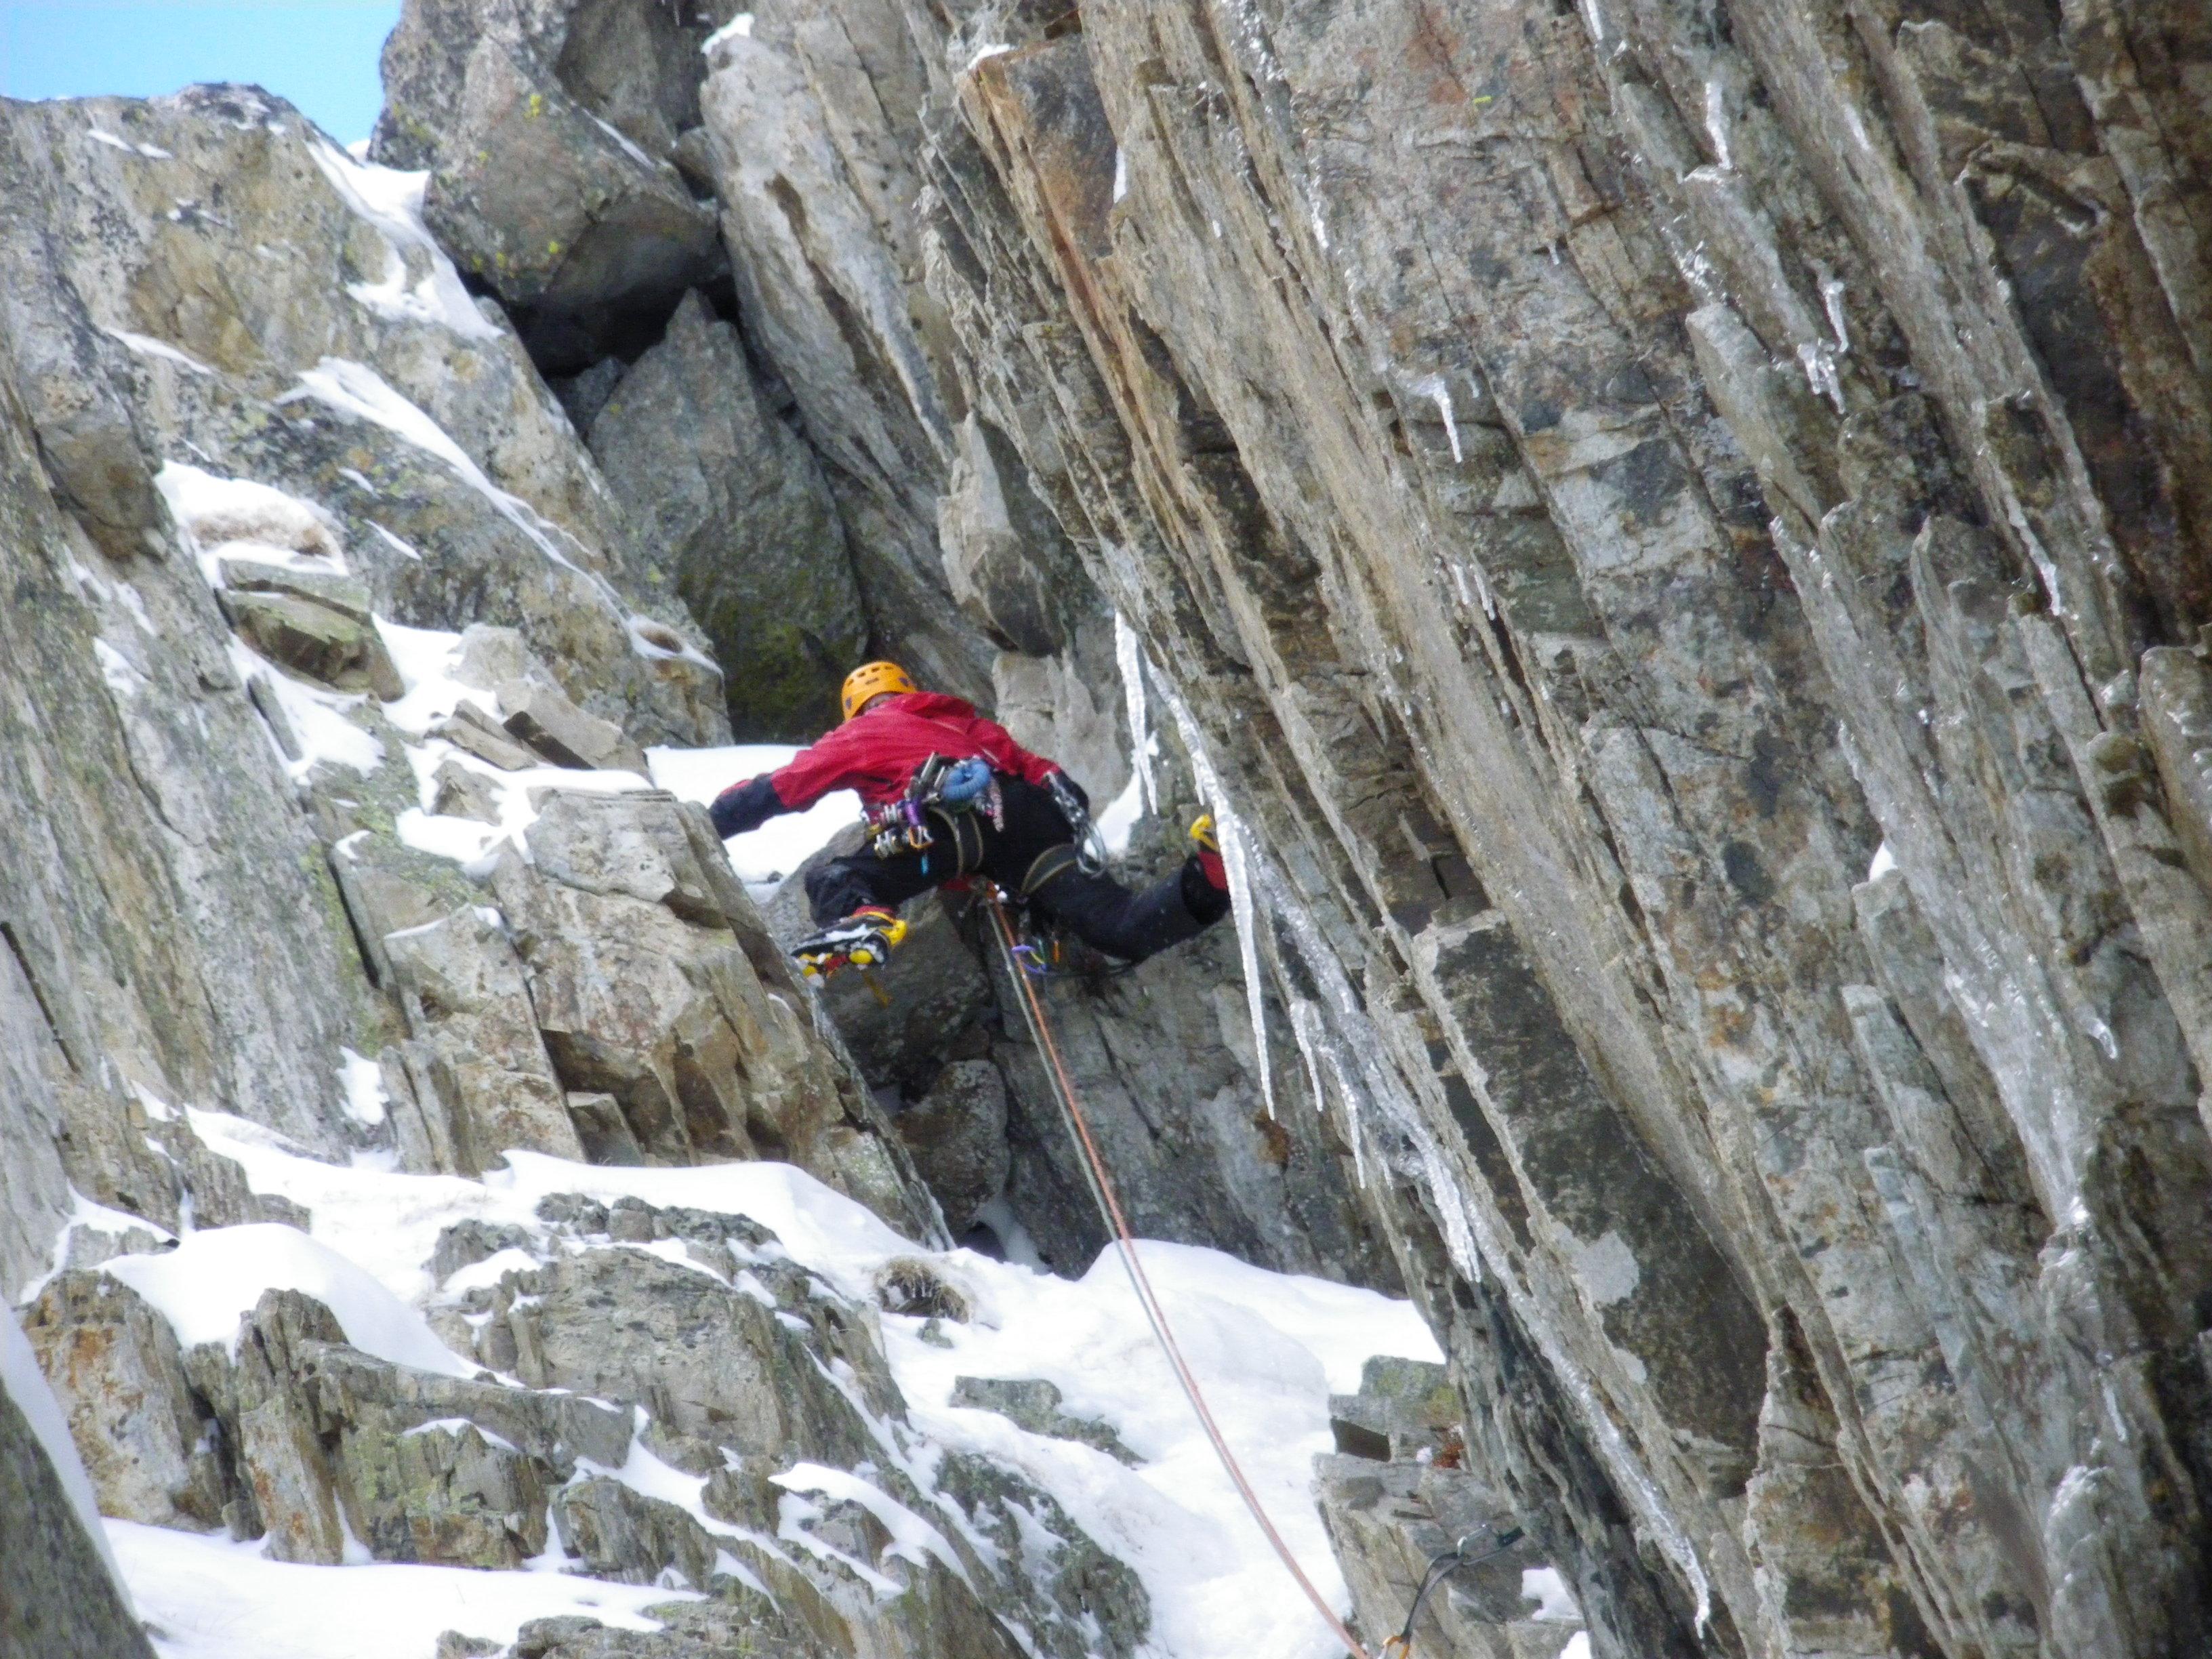 Curs Alpinisme Nivell 3